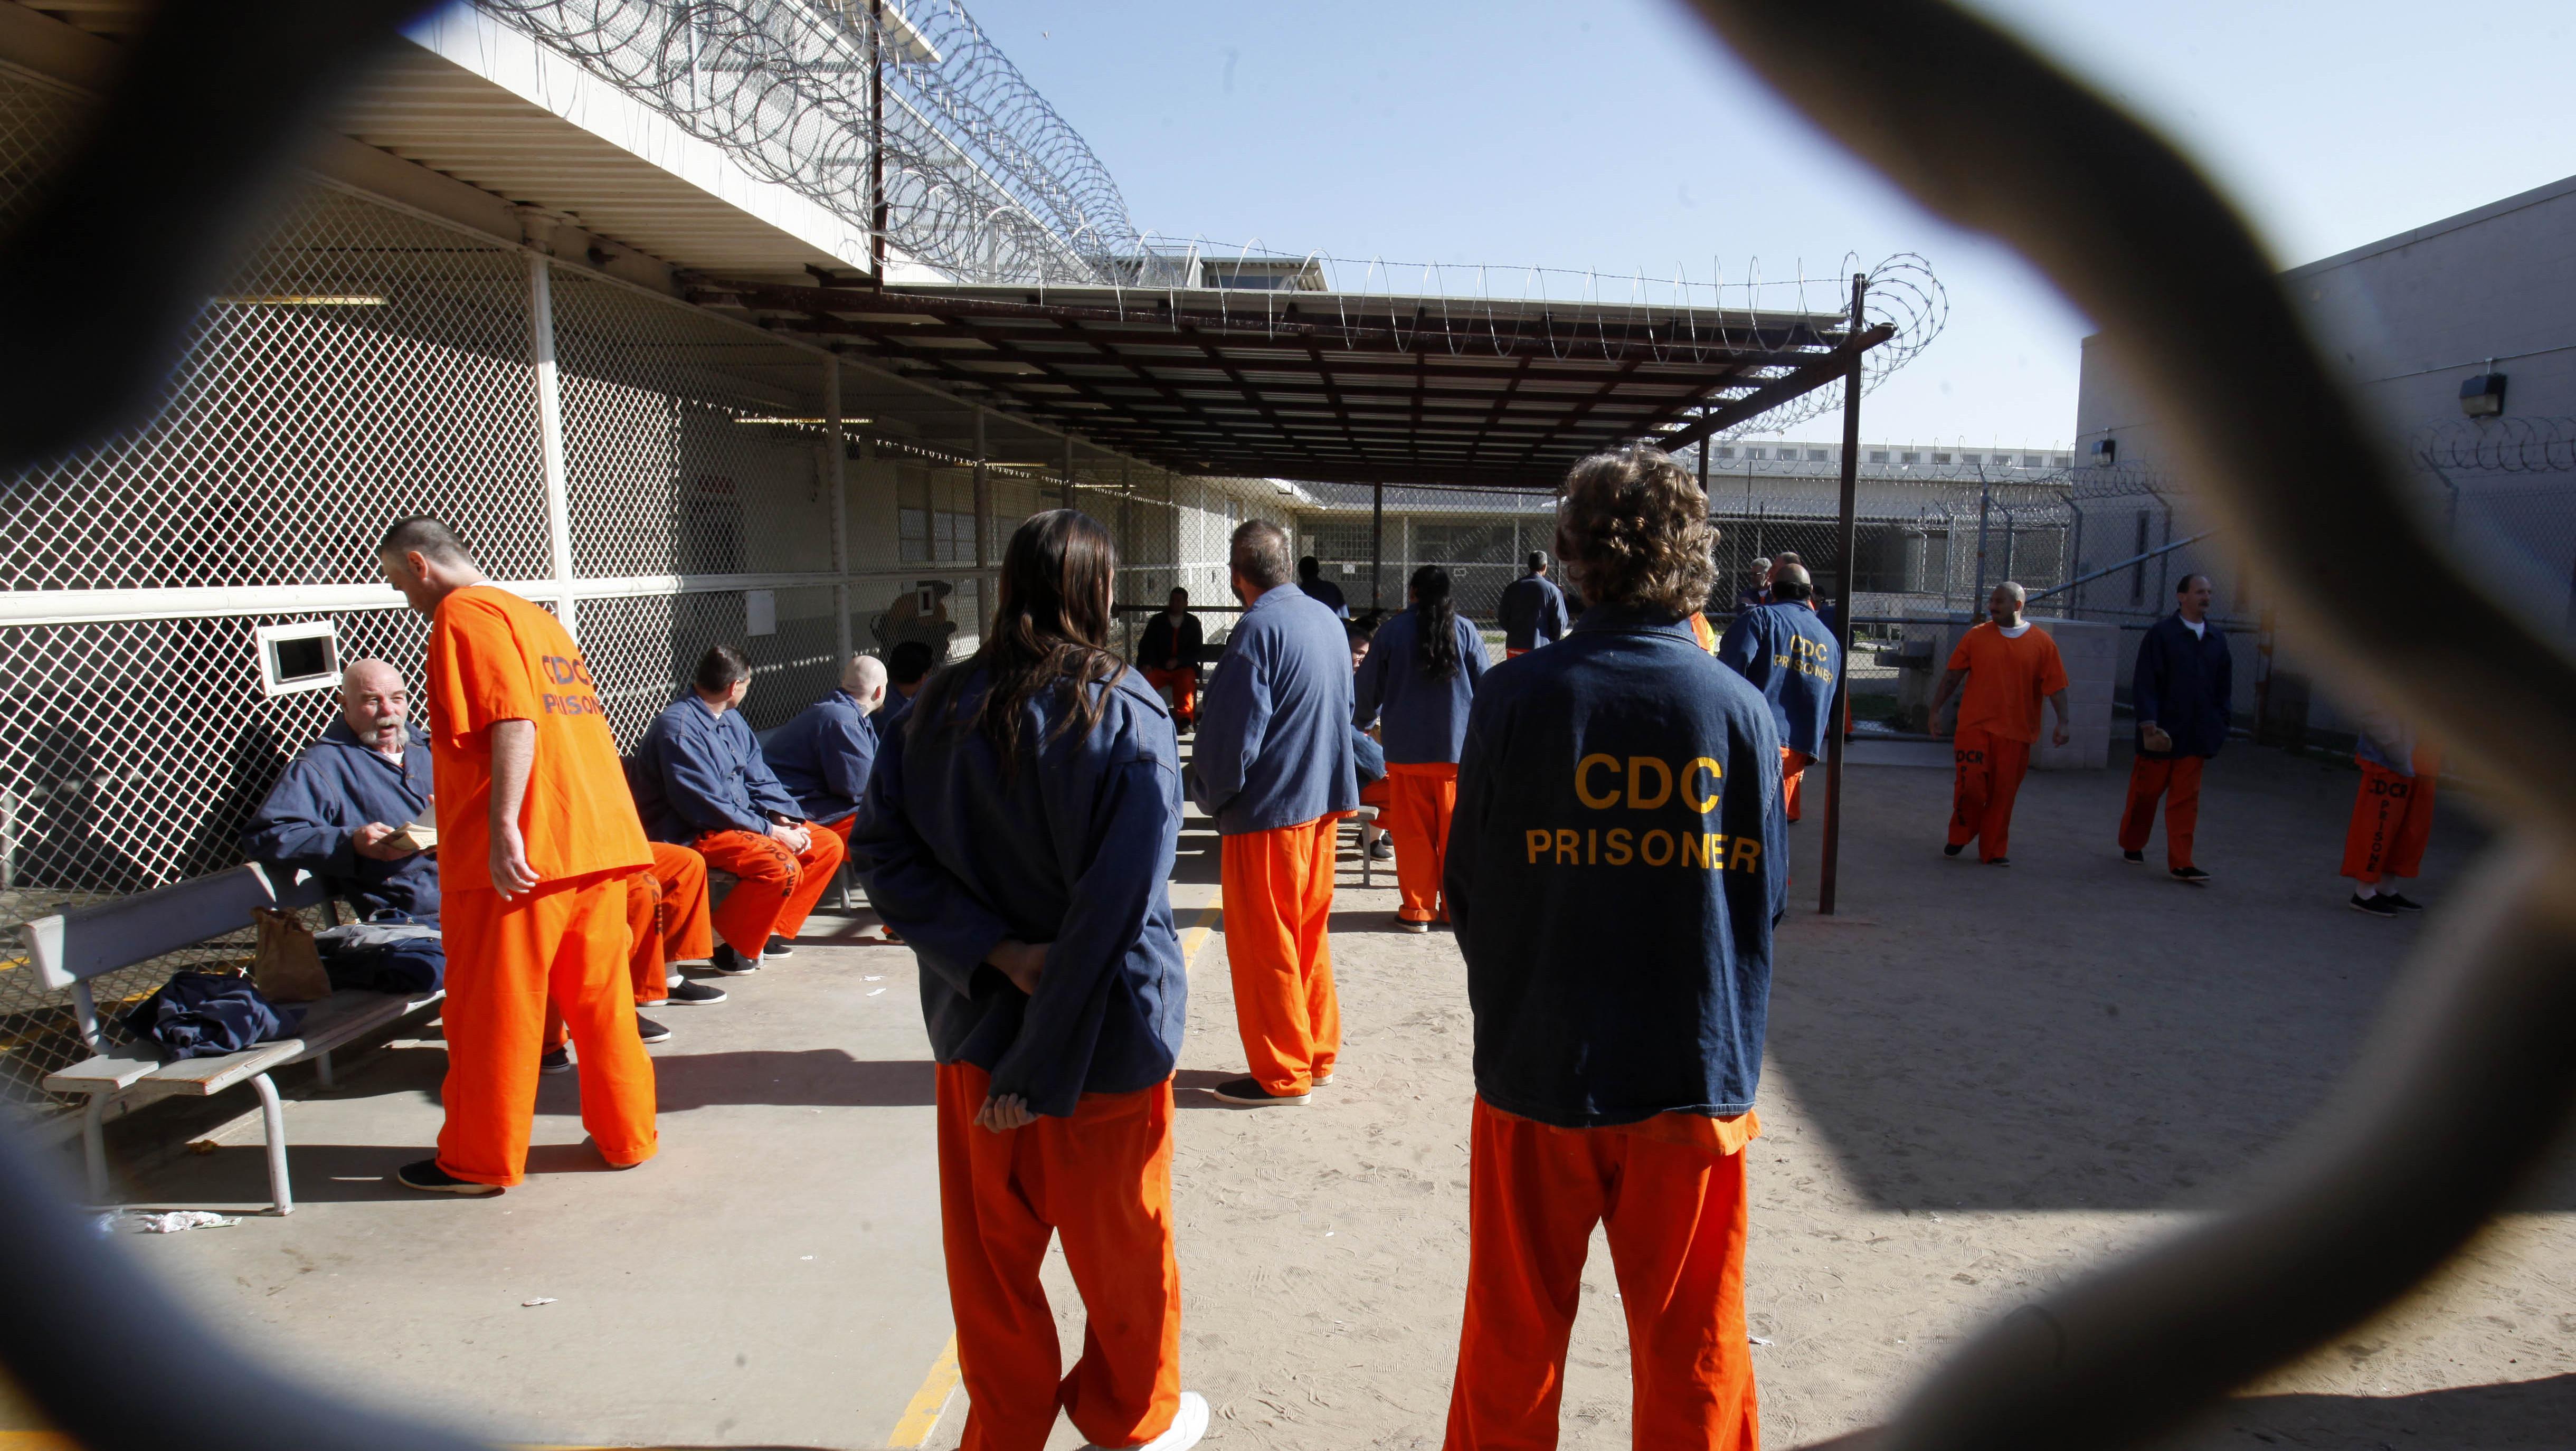 How Long Is Too Long? Congress Revisits Mandatory Sentences